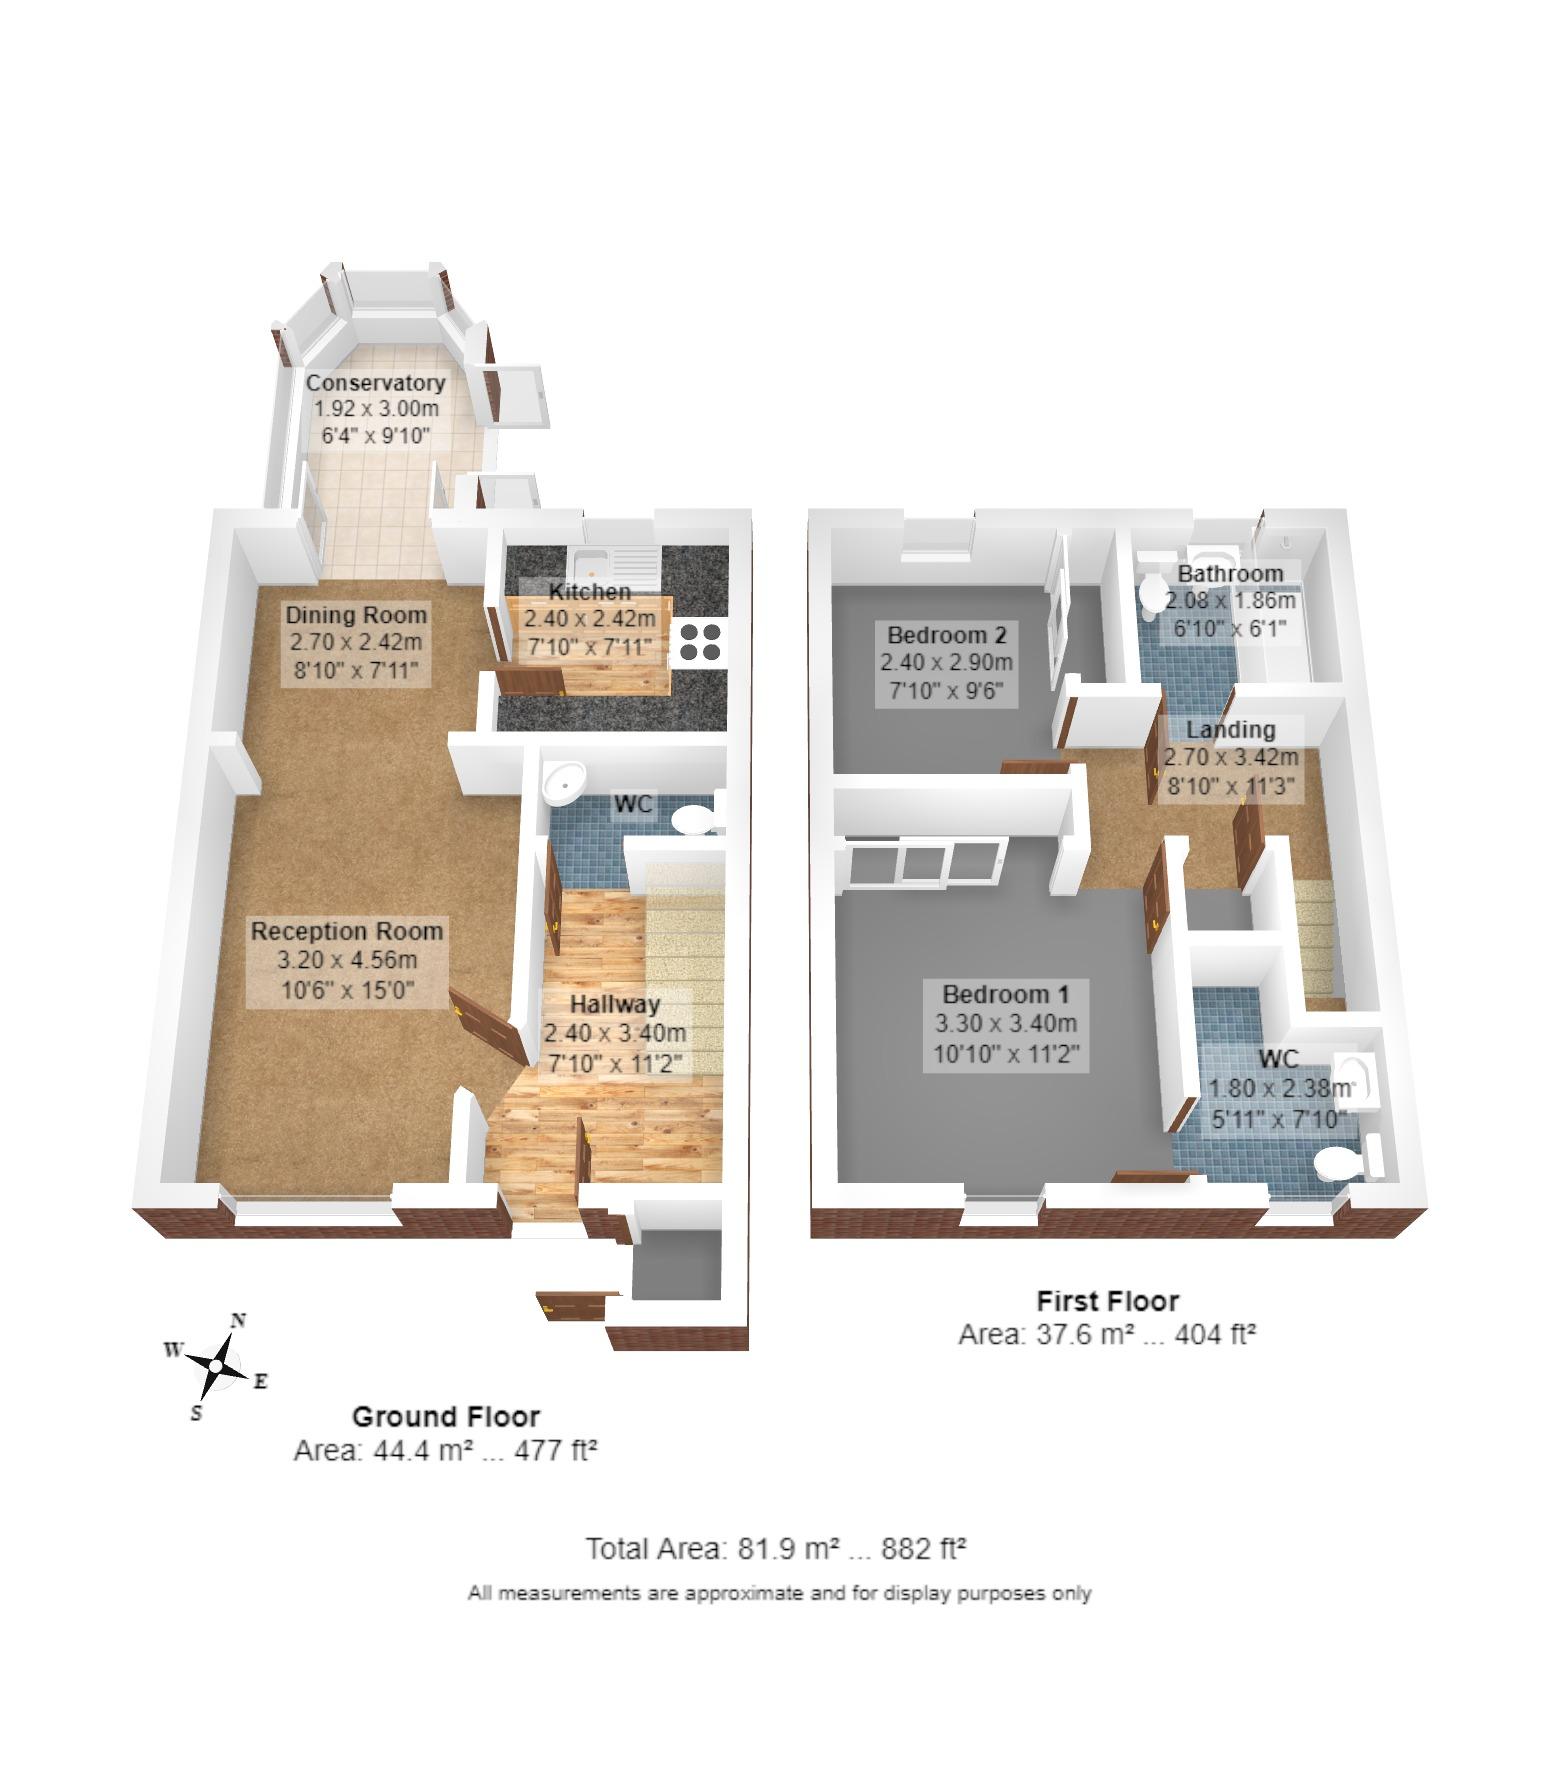 18 Whybrow Gardens Floorplan